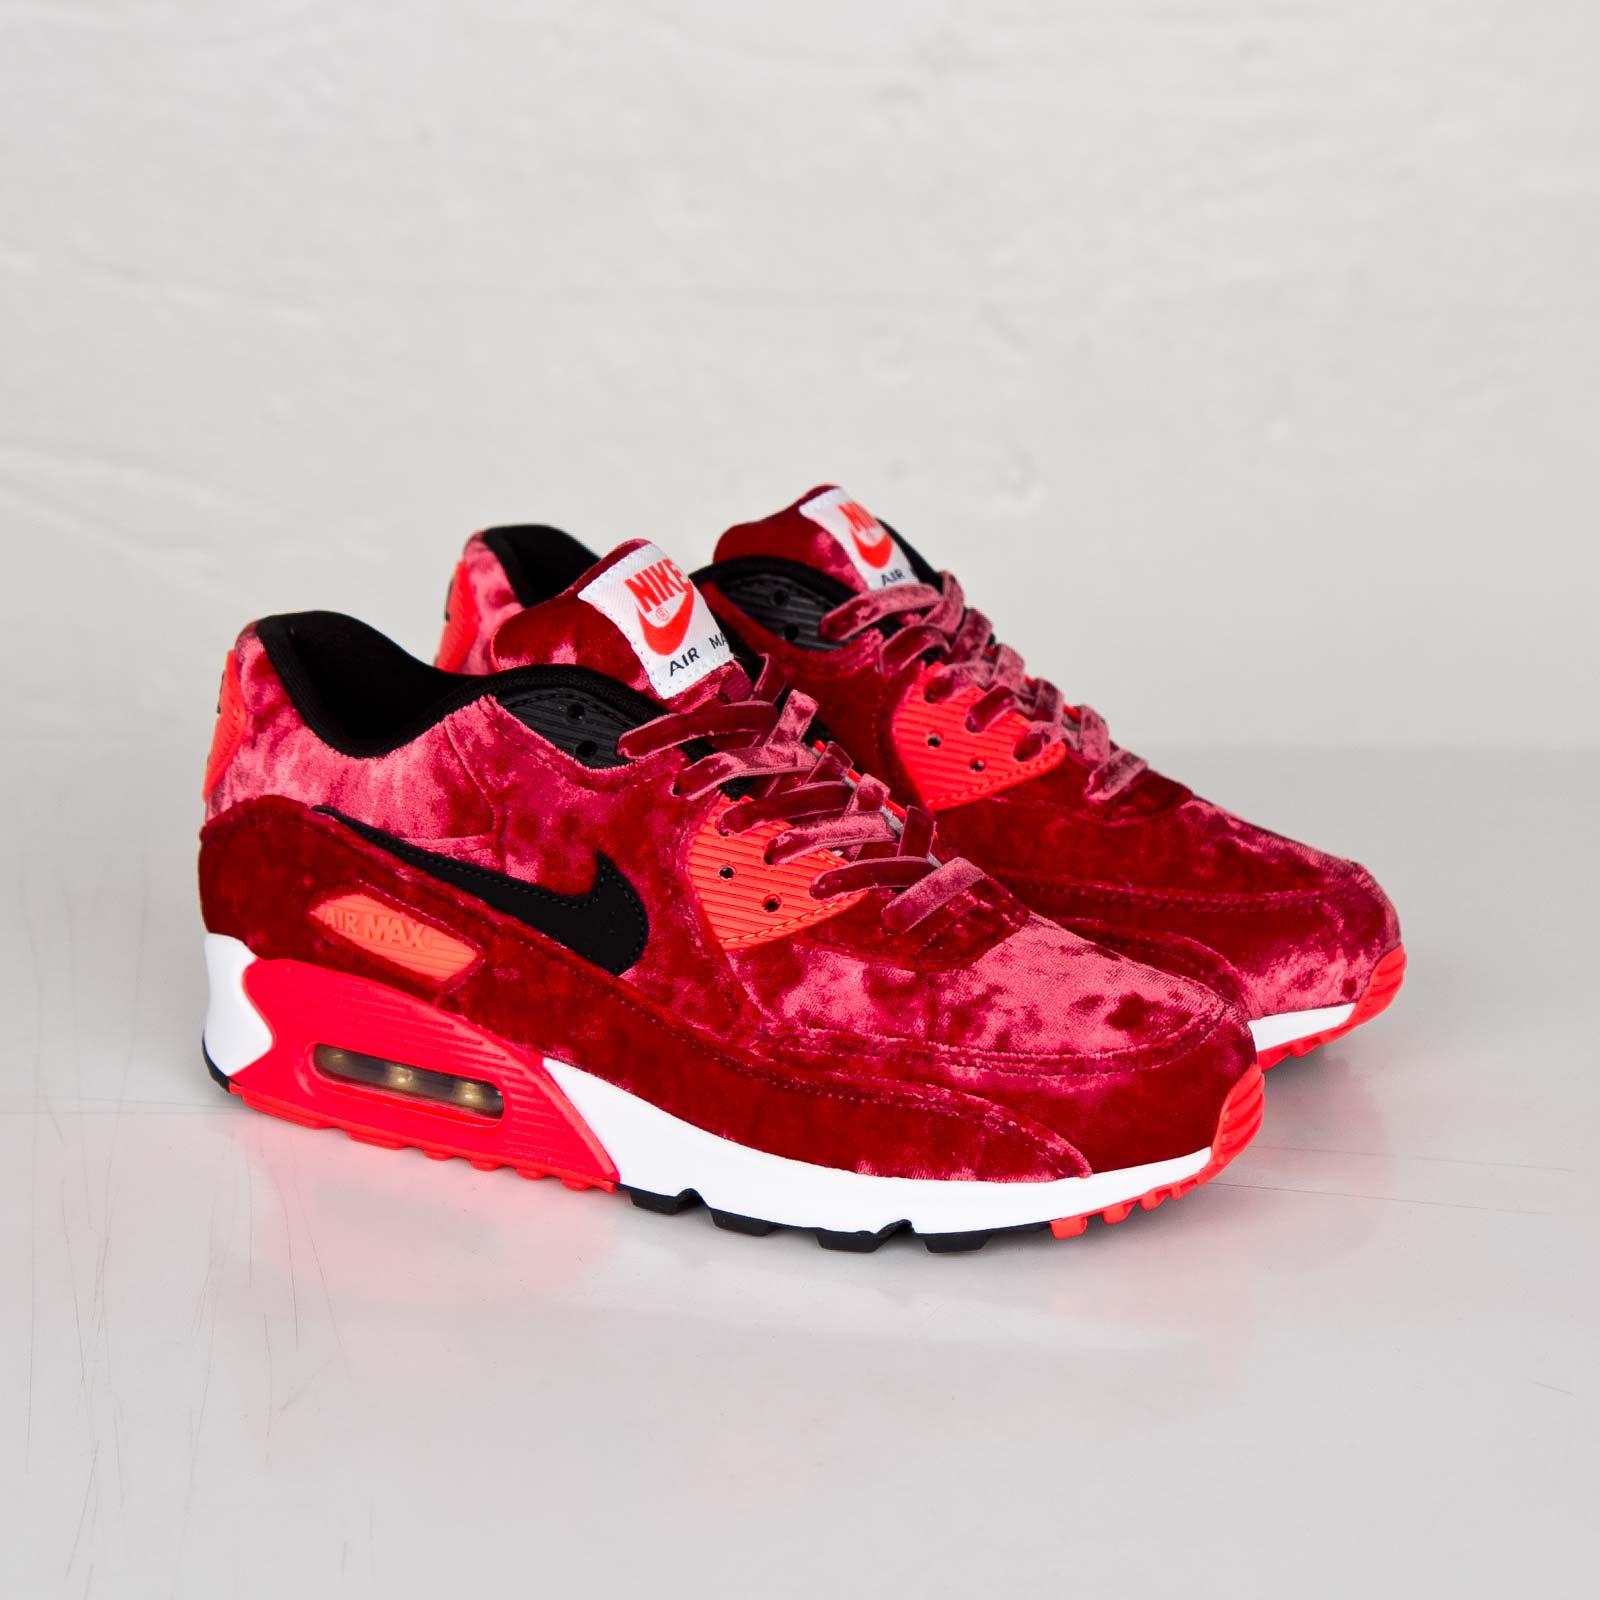 ff0ce150701c Nike W Air Max 90 Anniversary - 726485-600 - Sneakersnstuff ...